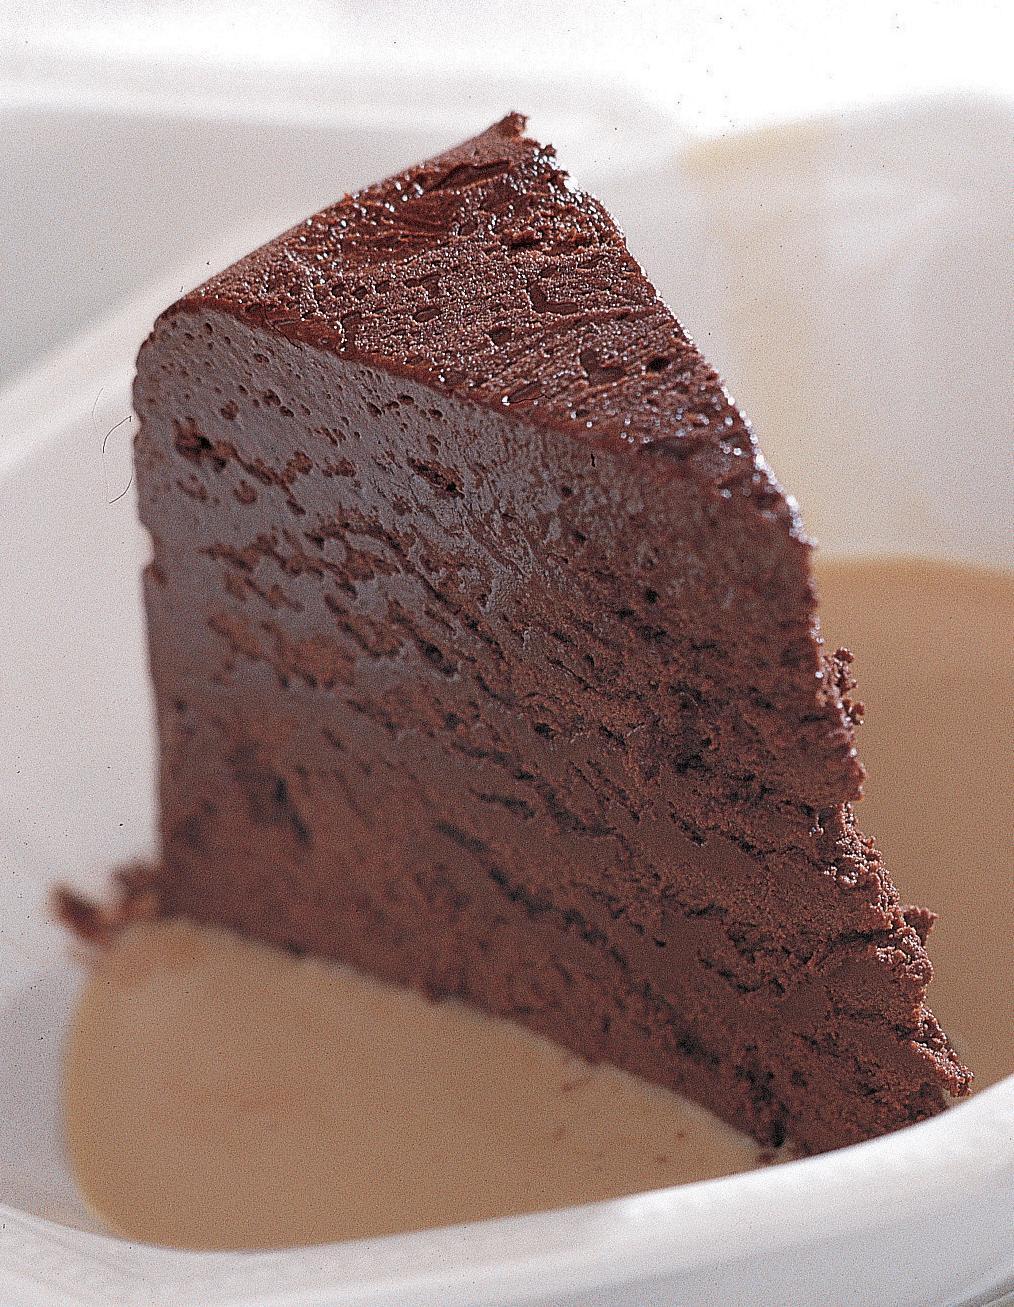 marquise au chocolat cr me anglaise au caf pour 6. Black Bedroom Furniture Sets. Home Design Ideas